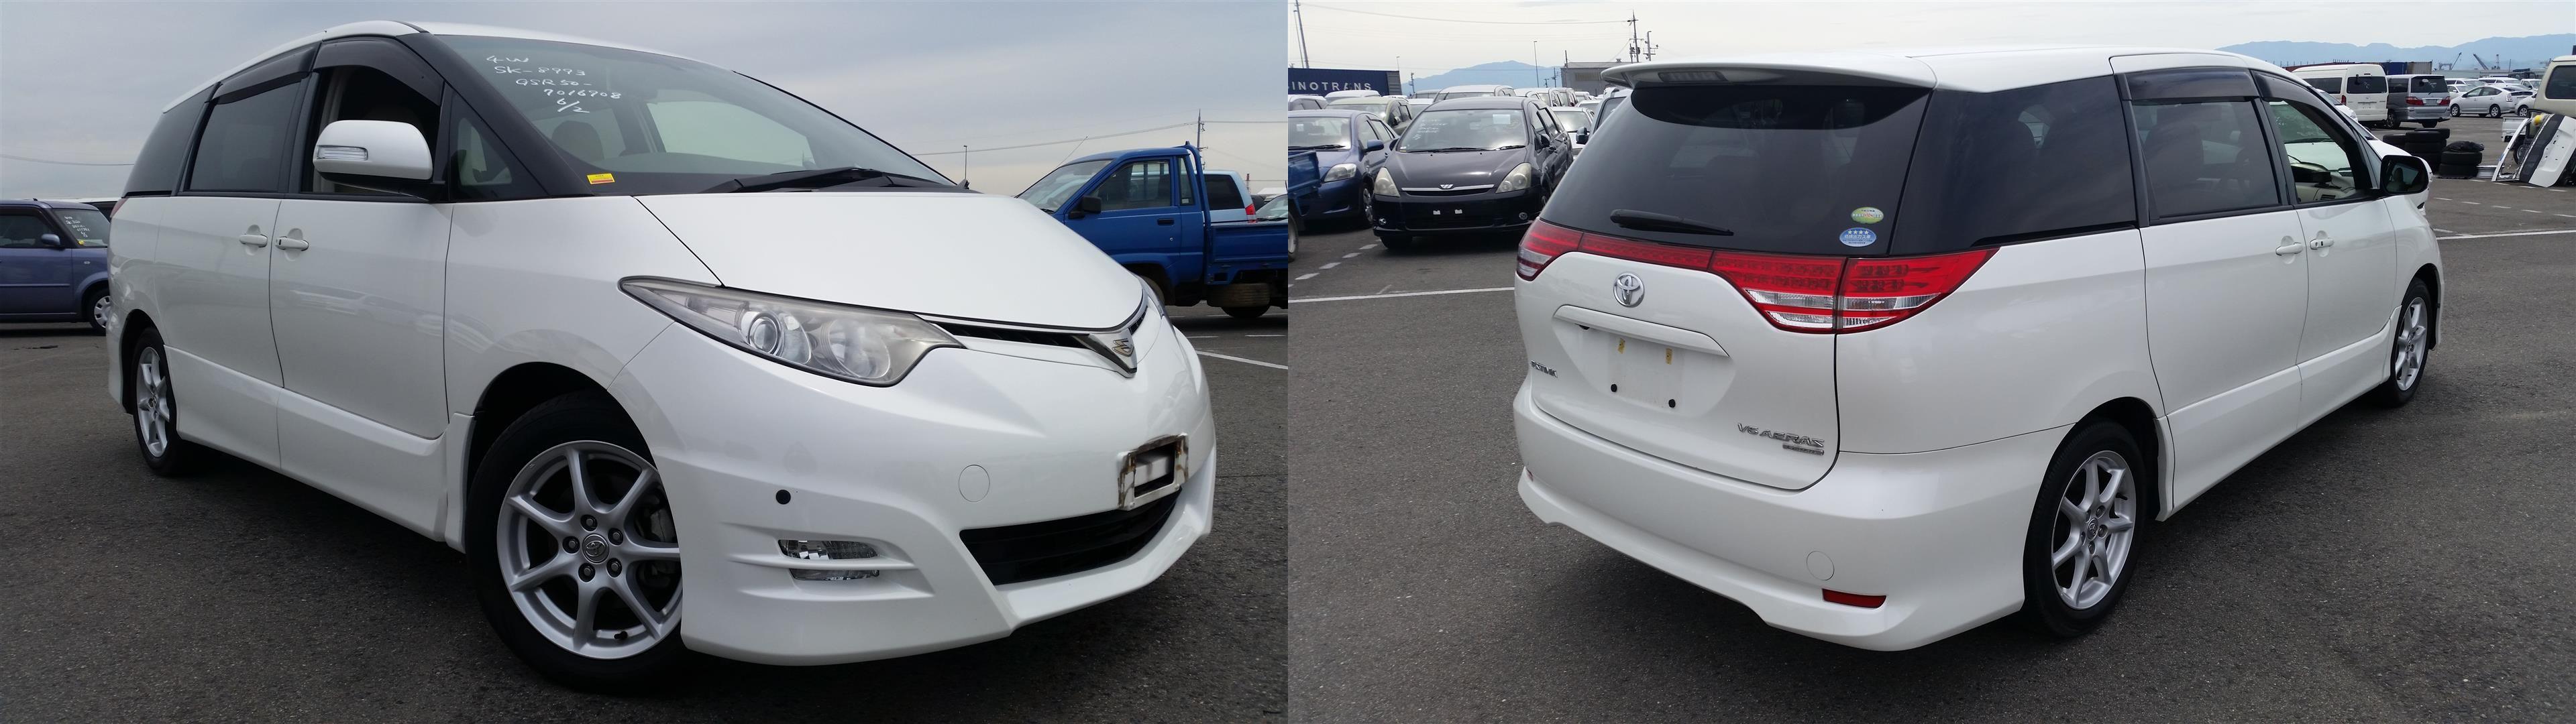 Buy Japanese Import Cars, Japan Car Auction Broker for ...